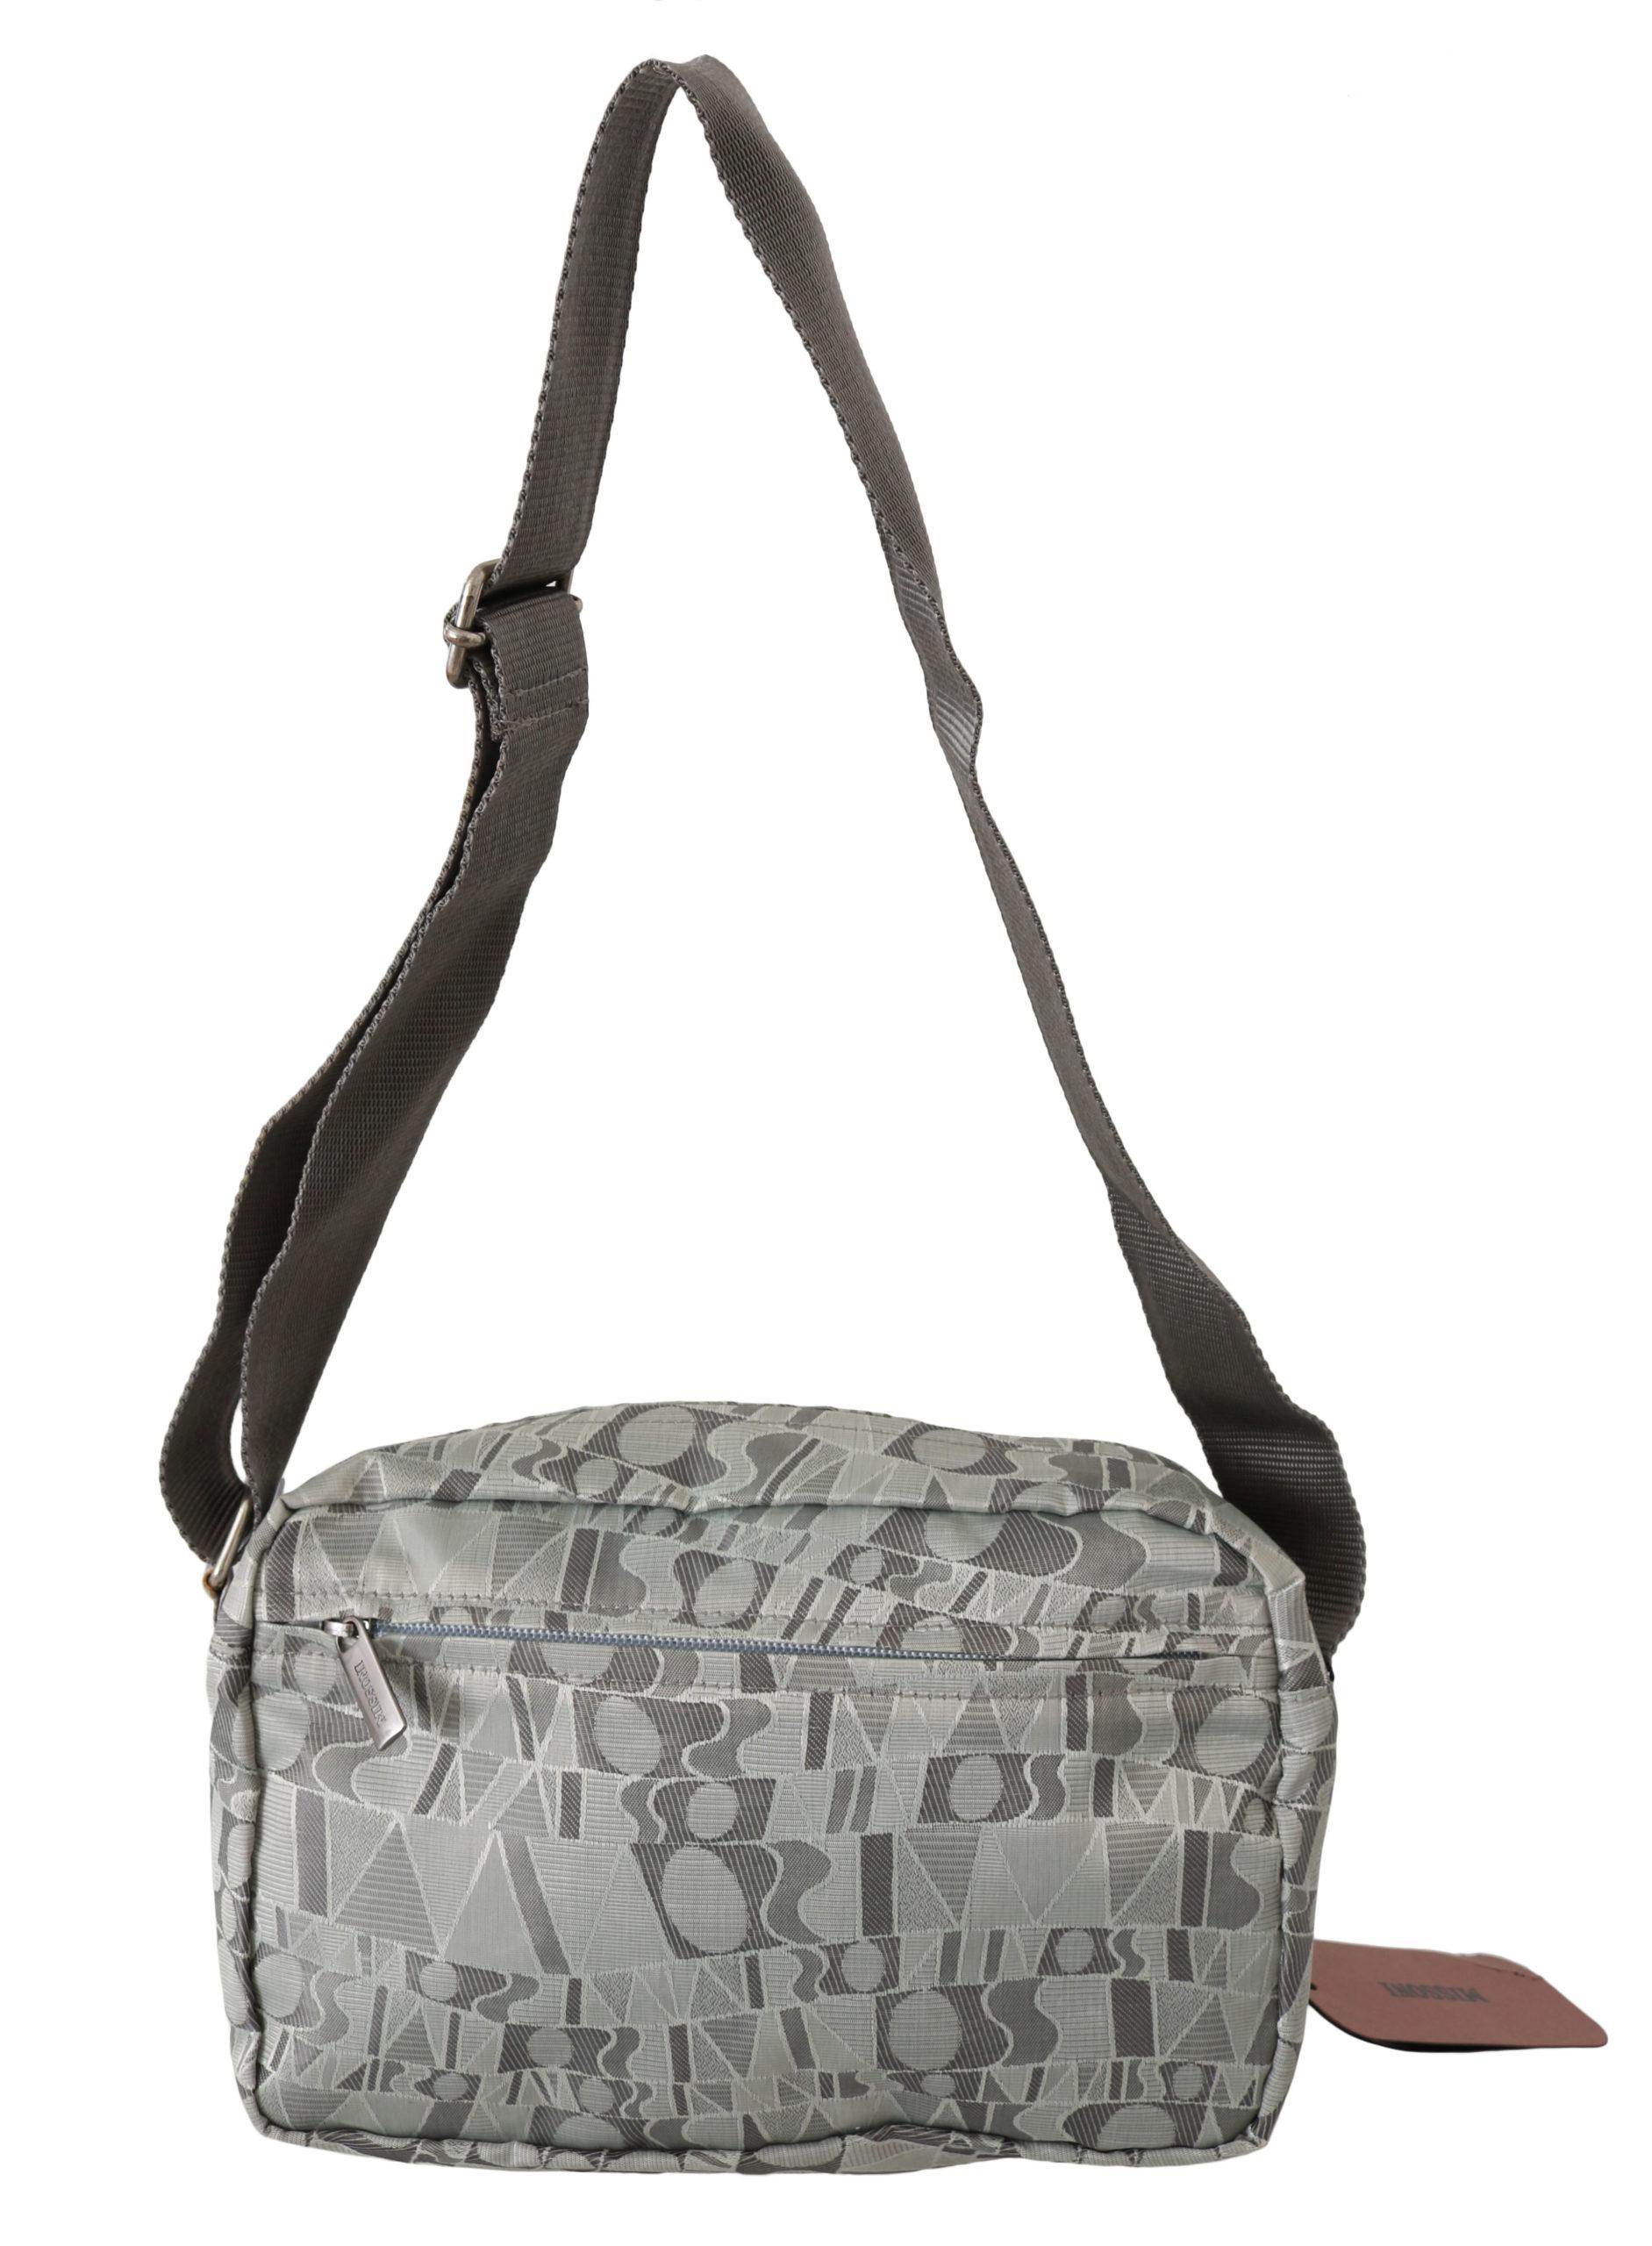 Missoni Women's Printed Sling Shoulder Bag Gray VAS9007